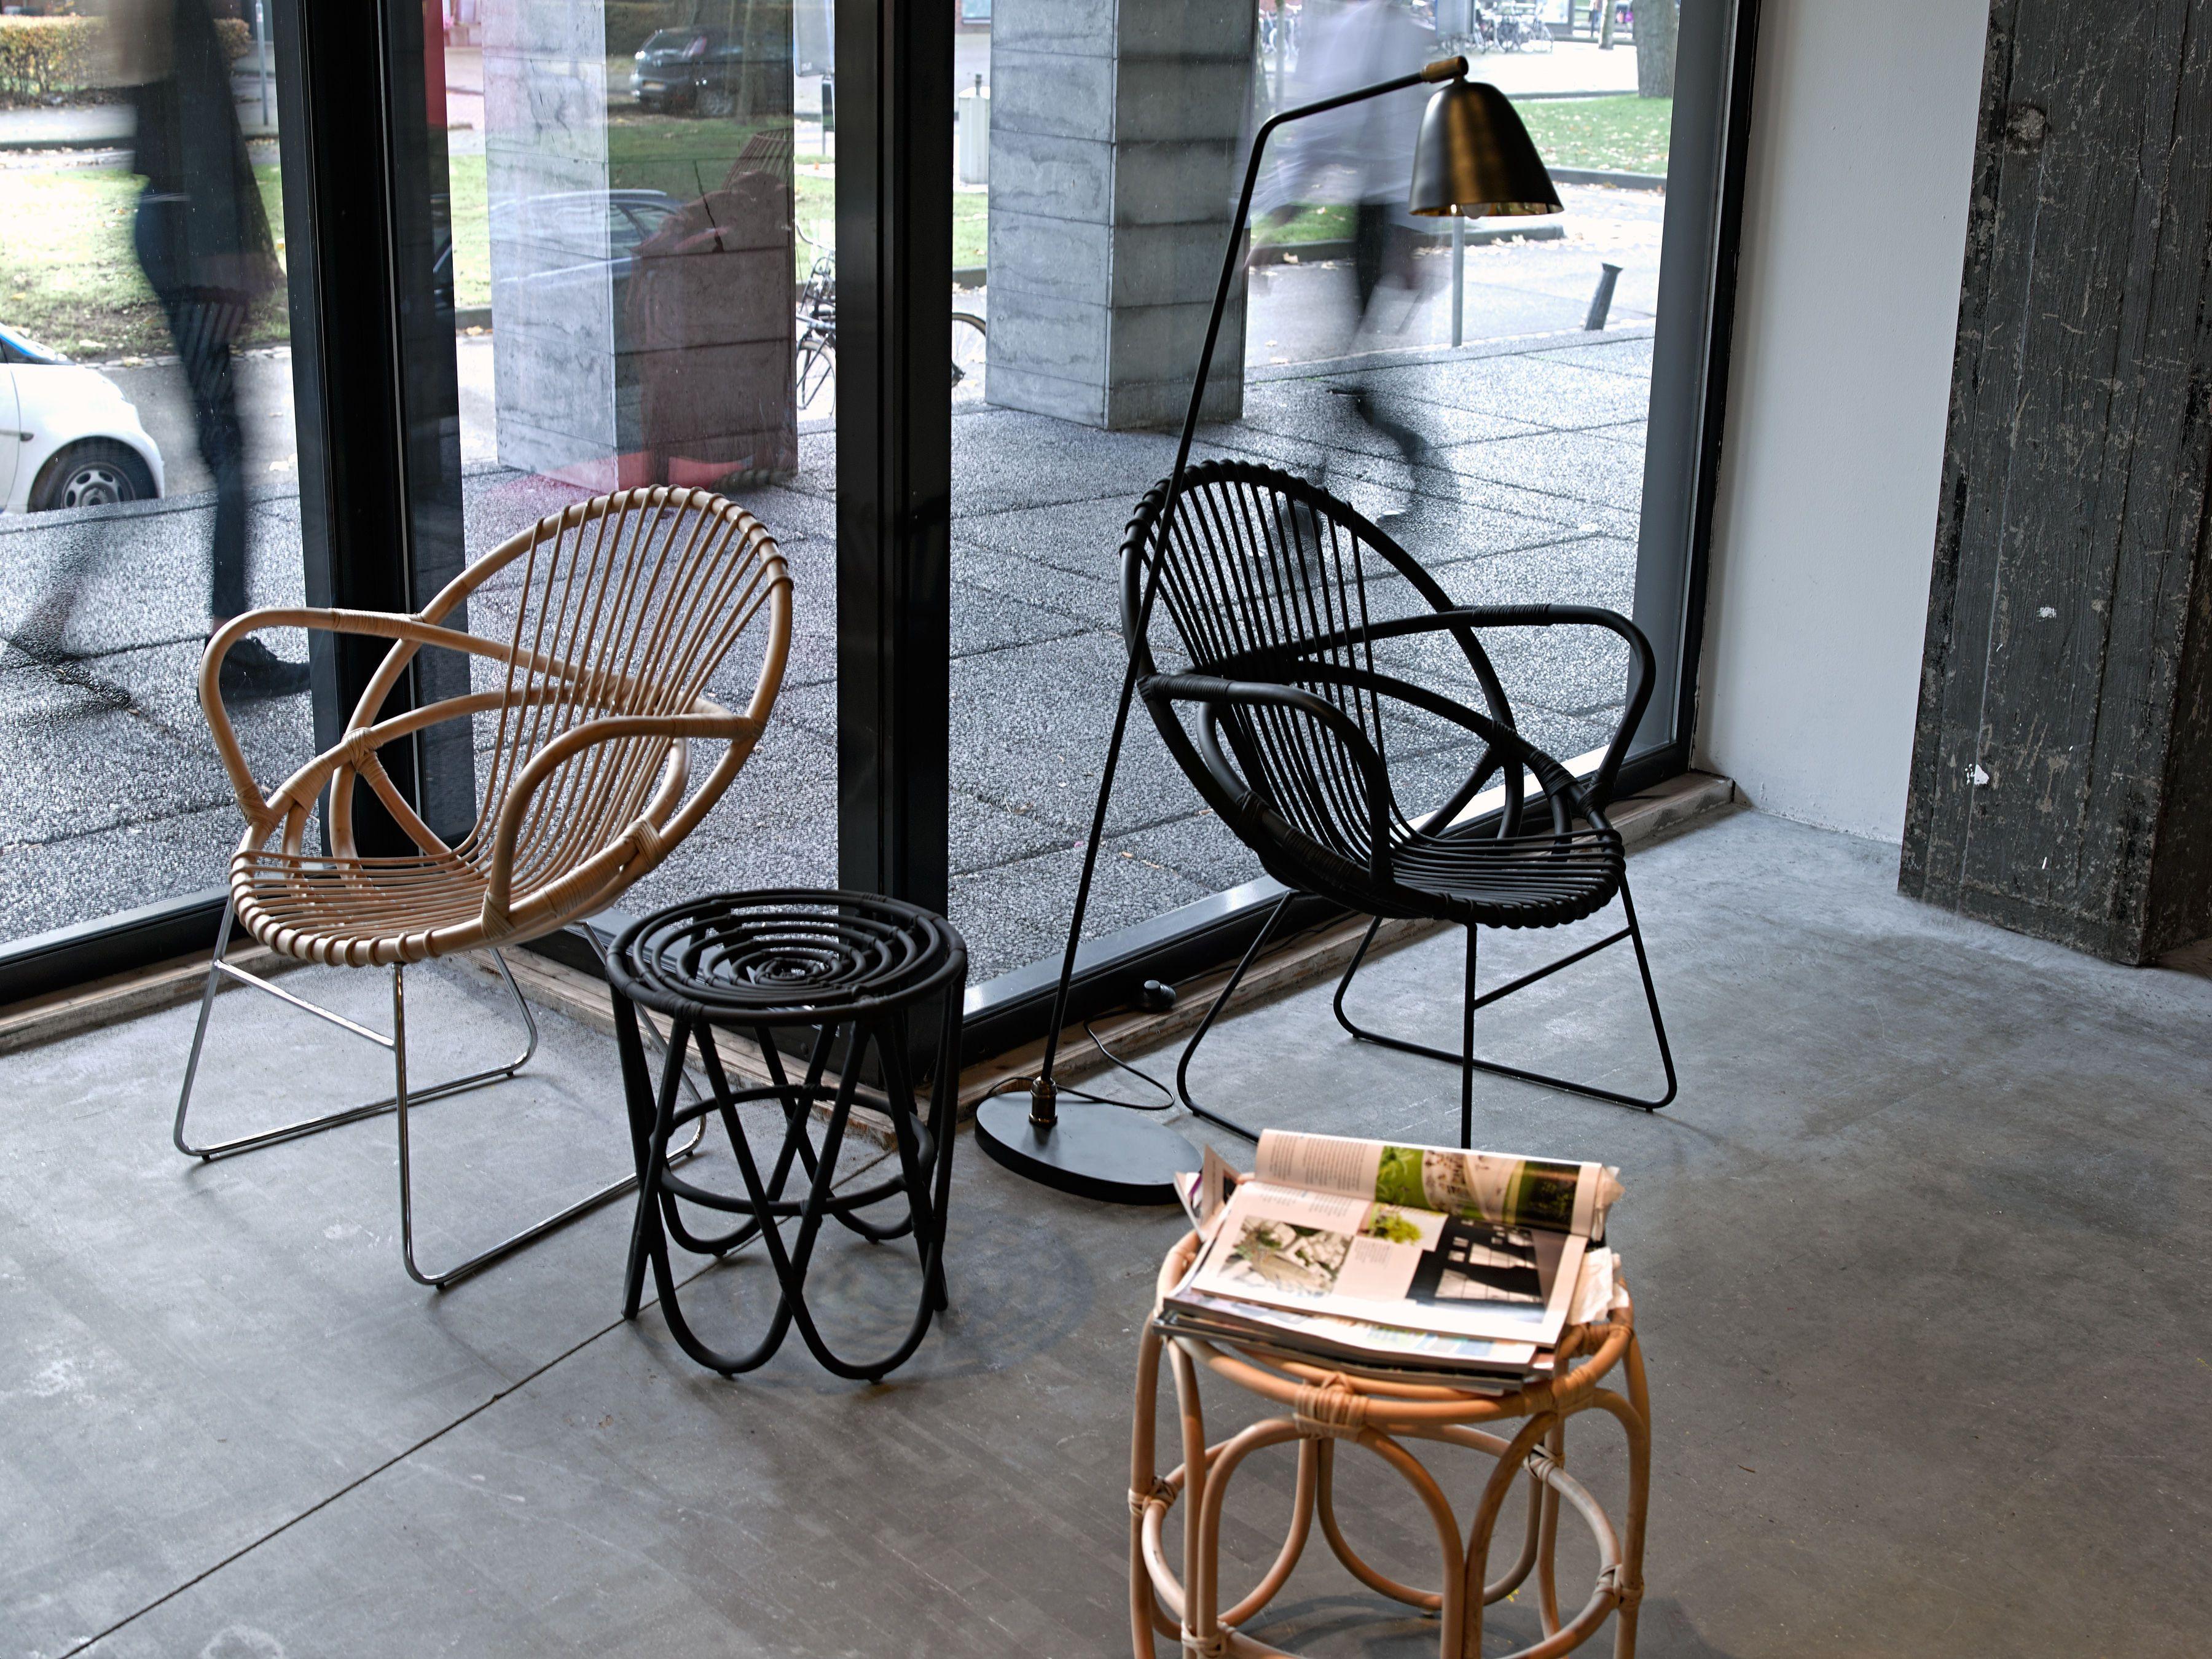 Paperclip Stool / Rattan Ø 40 x H 46 cm by Pols Potten